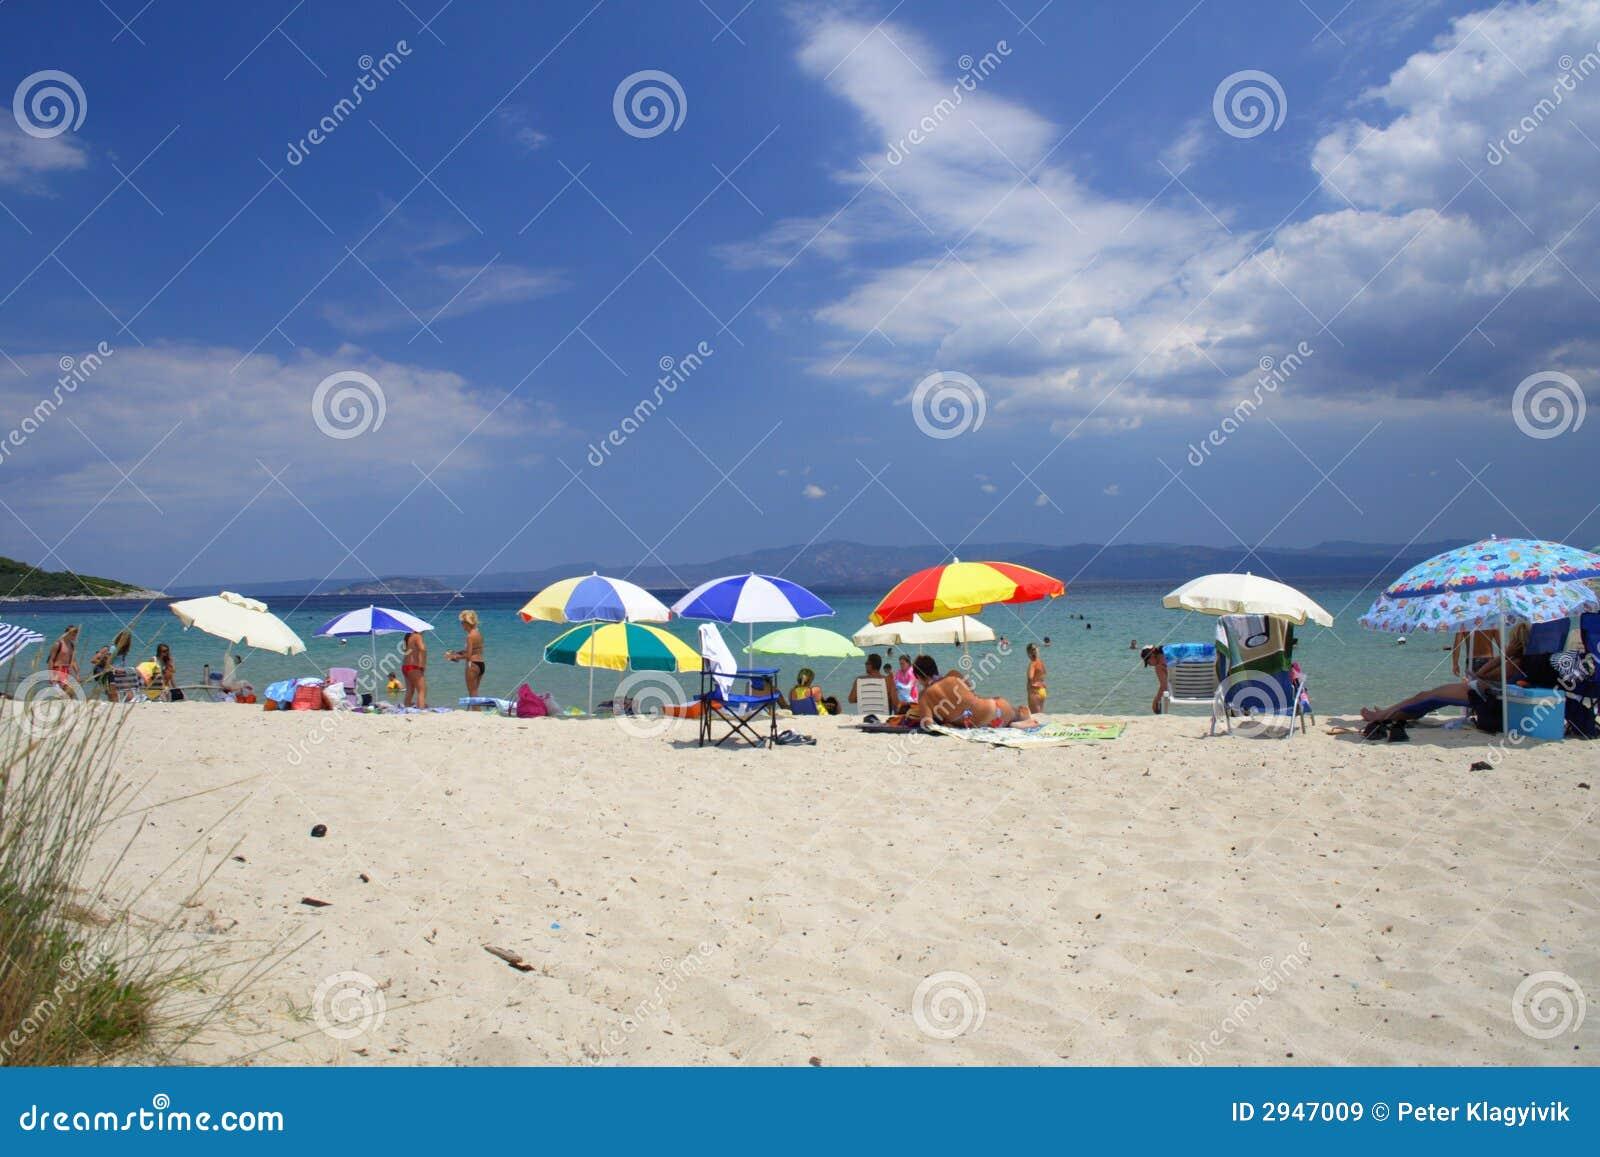 Beach Umbrella Relaxing Summer Vacation Stock Photo